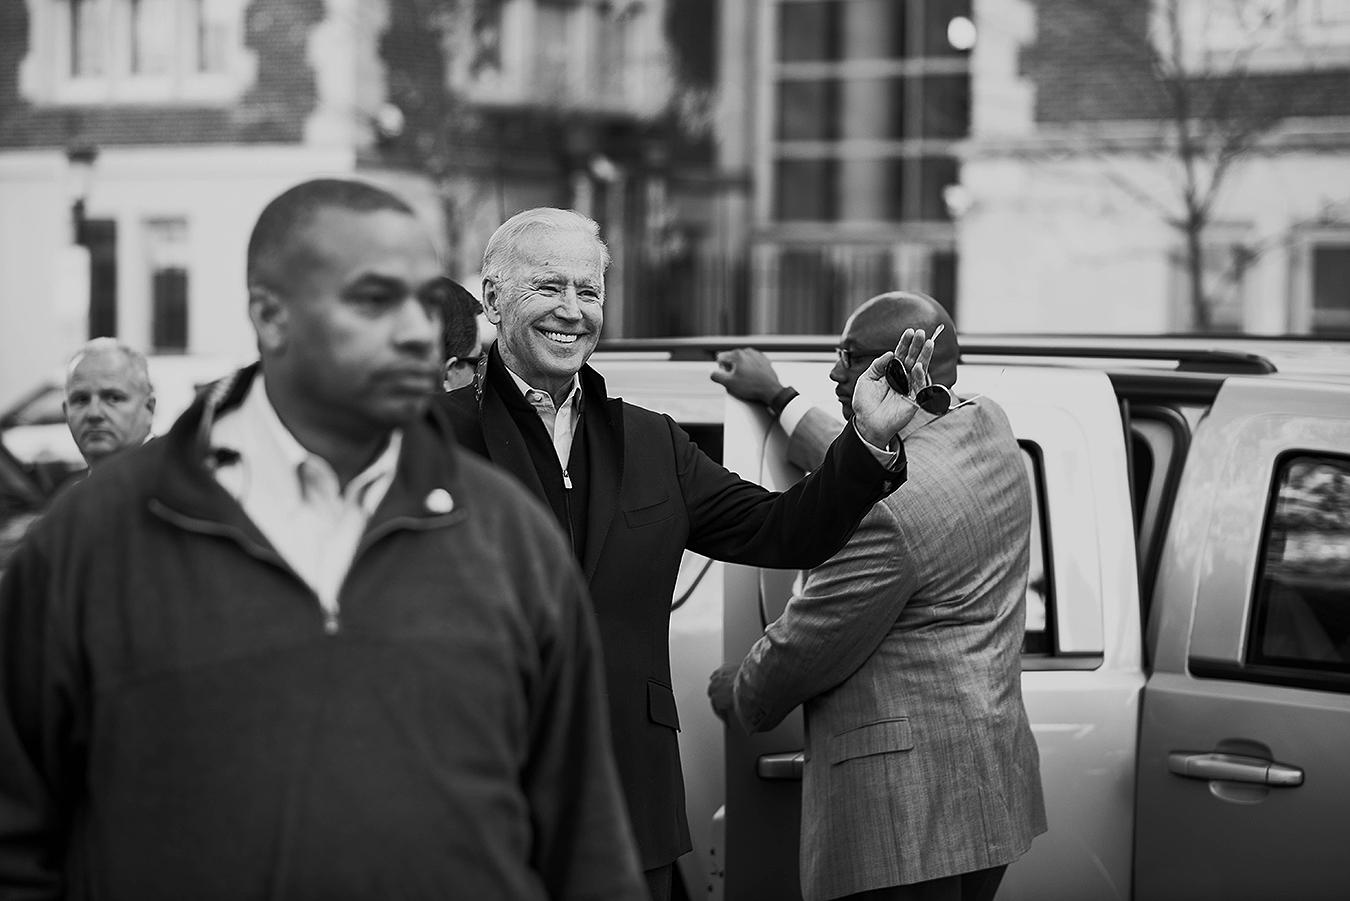 Germinaro_Kaleb_election_2016_reaction_blacklivesmatter_peoplematter_love_together_Joe_Biden_2